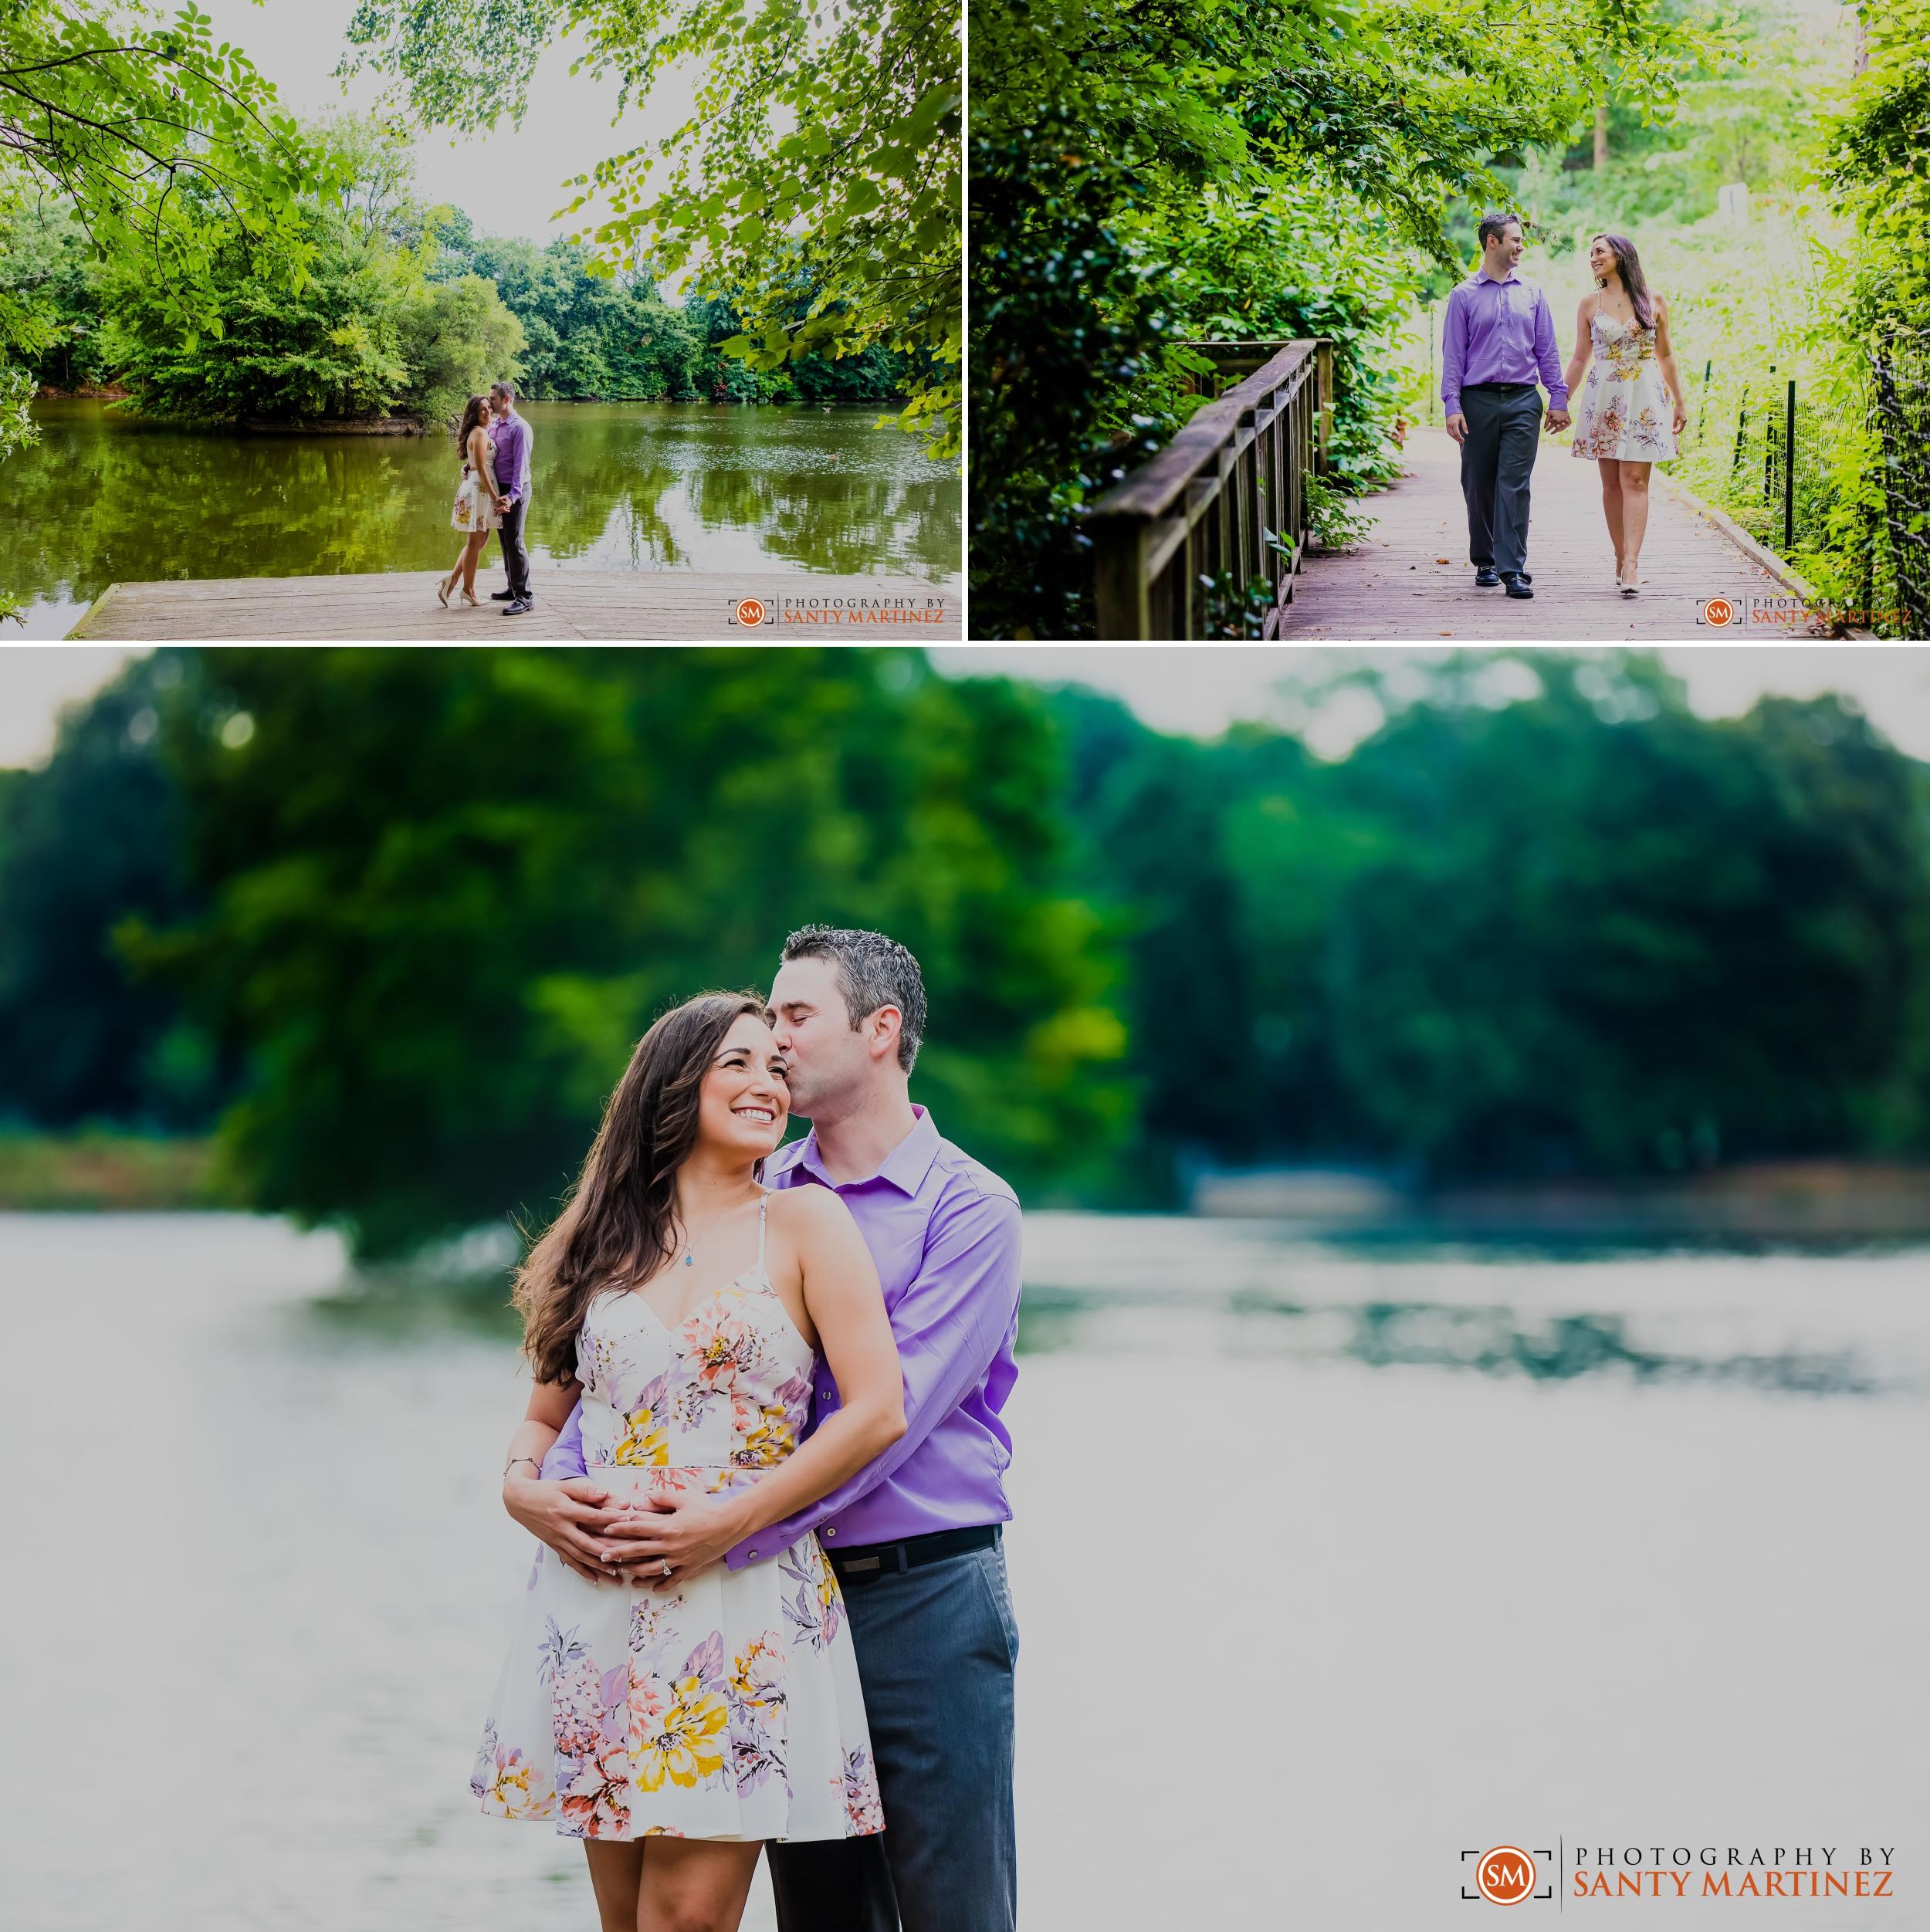 Engagement Session Piedmont Park - Santy Martinez Photography 1.jpg